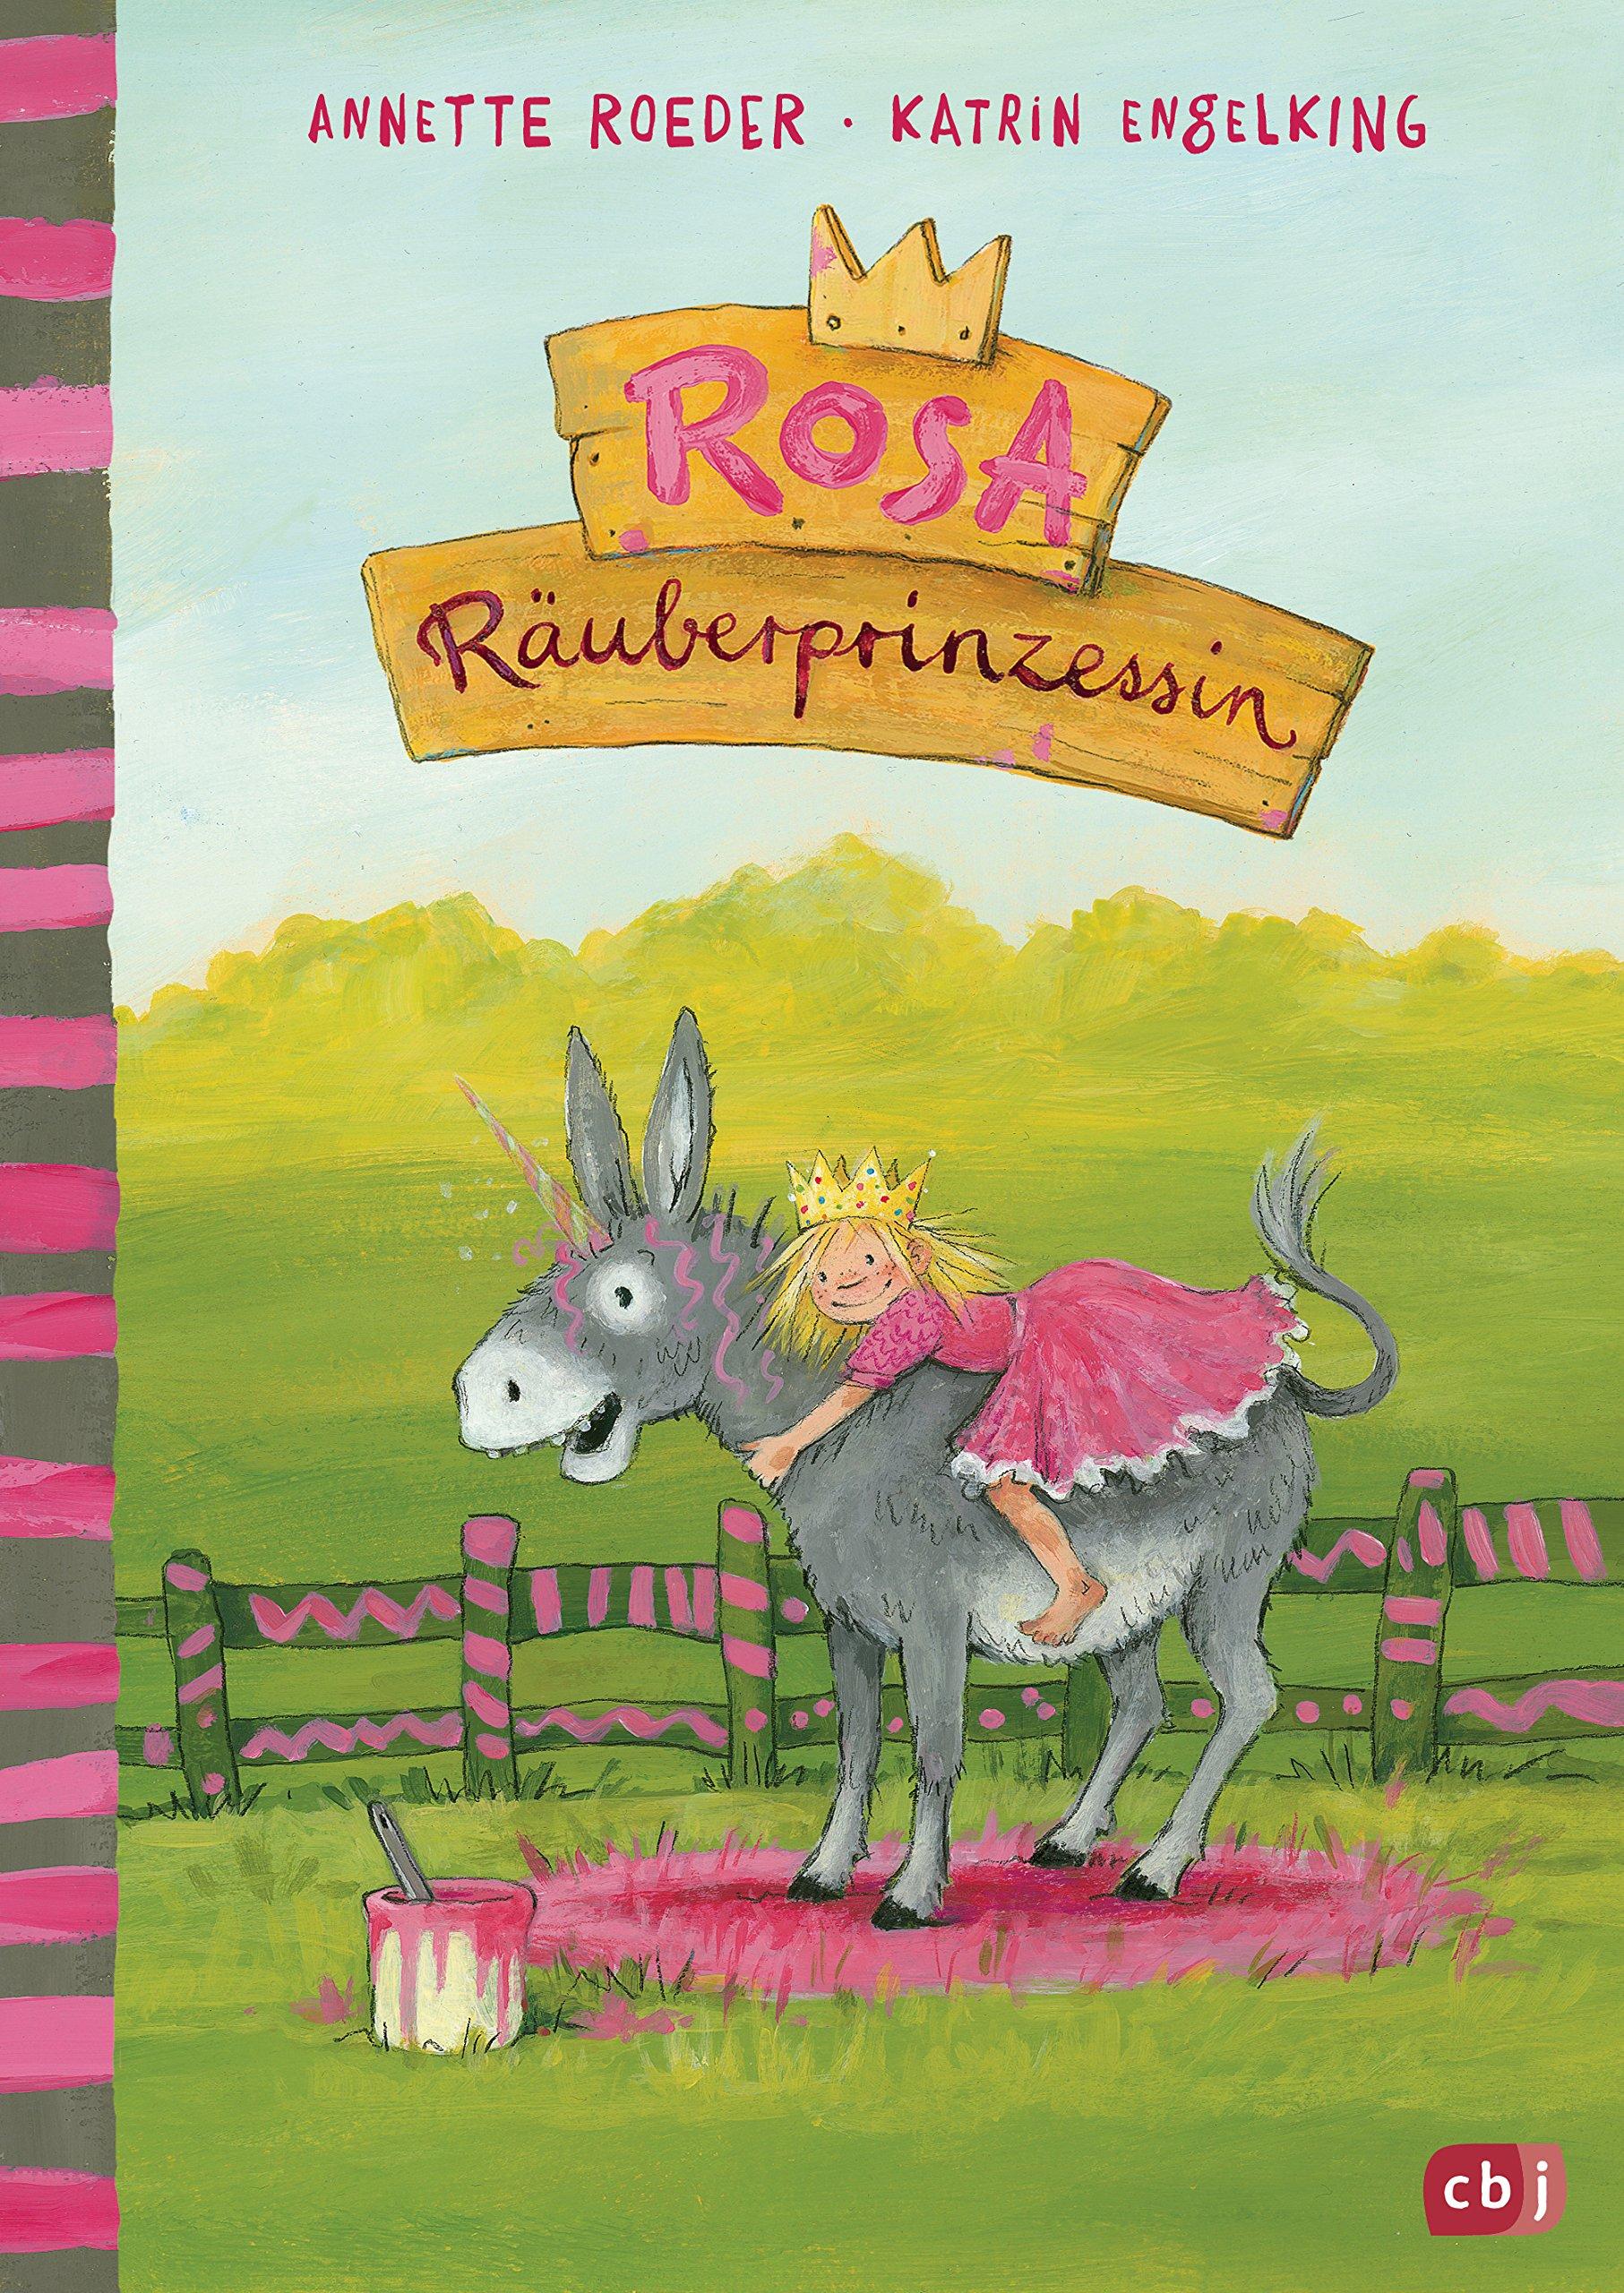 Rosa Räuberprinzessin (Die Rosa Räuberprinzessin-Reihe, Band 1) Gebundenes Buch – 23. Juli 2018 Annette Roeder Katrin Engelking cbj 3570170888